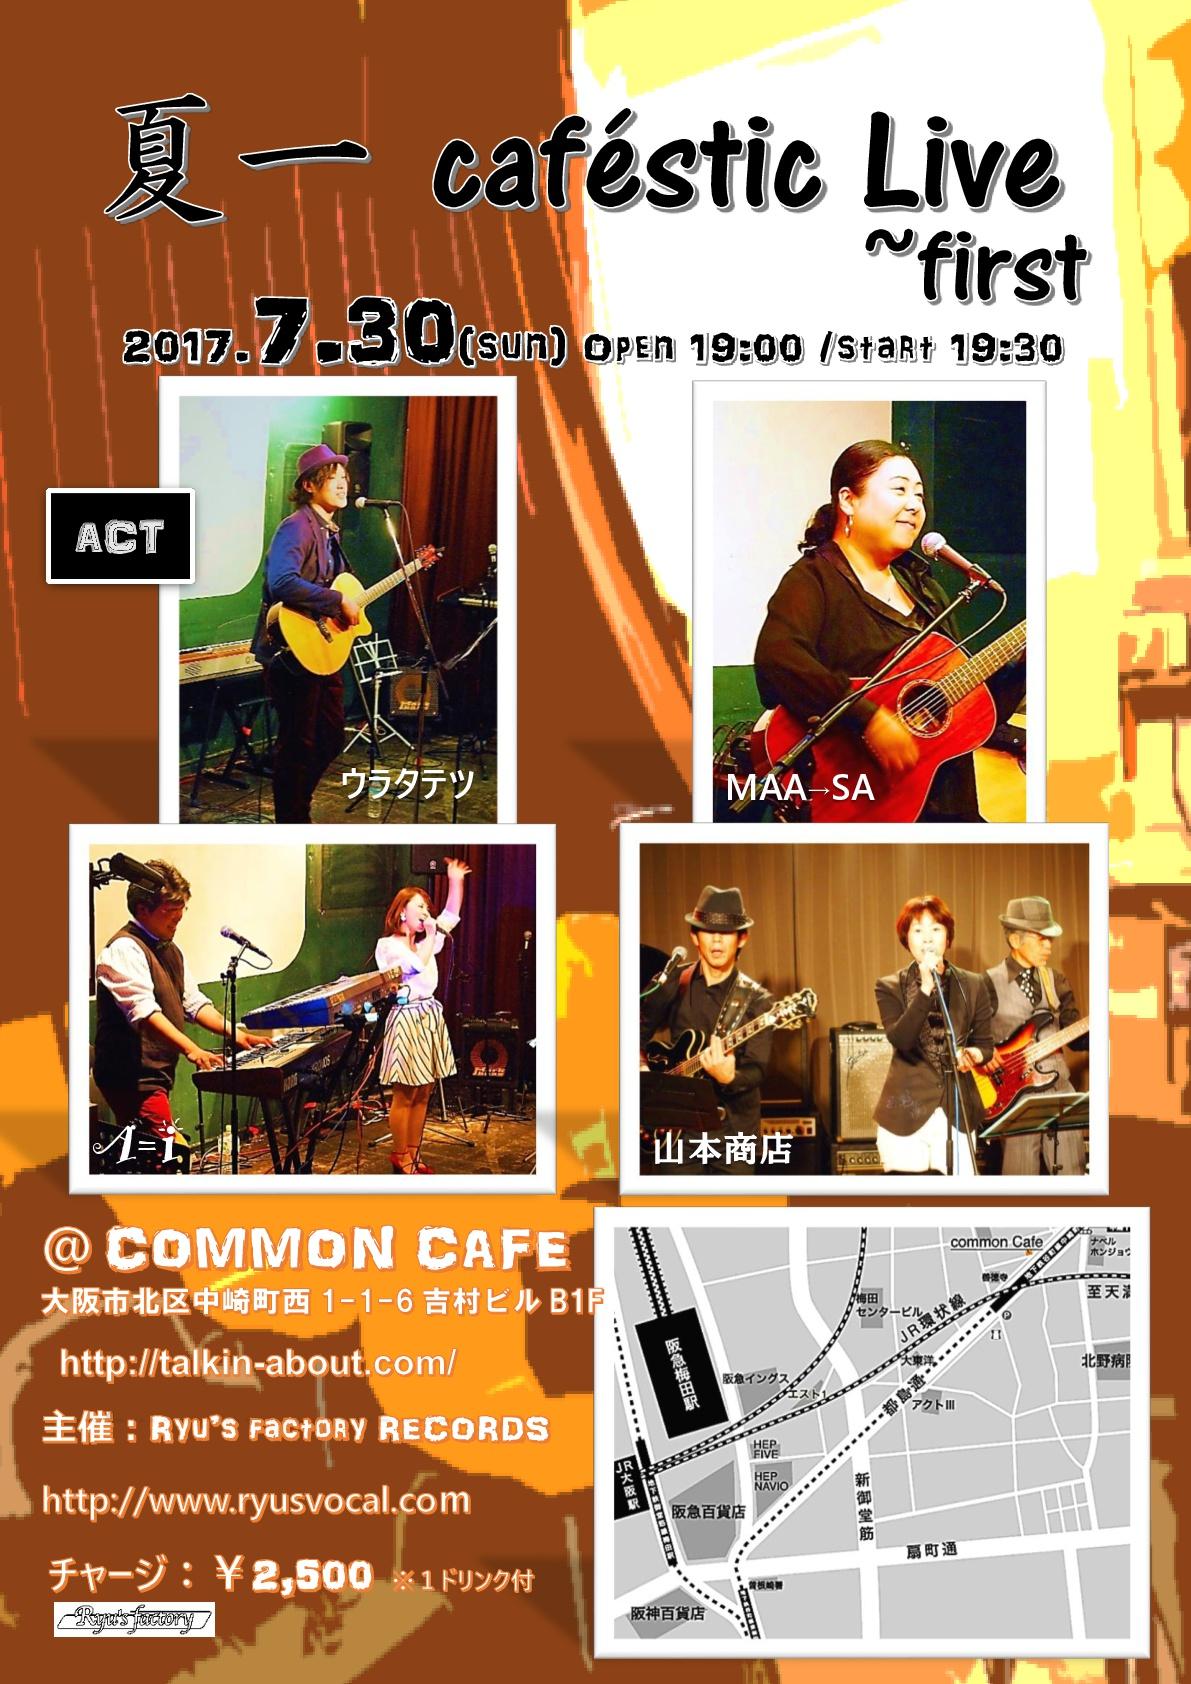 Ryu'sイベント 夏一 caféstic LIVE~first